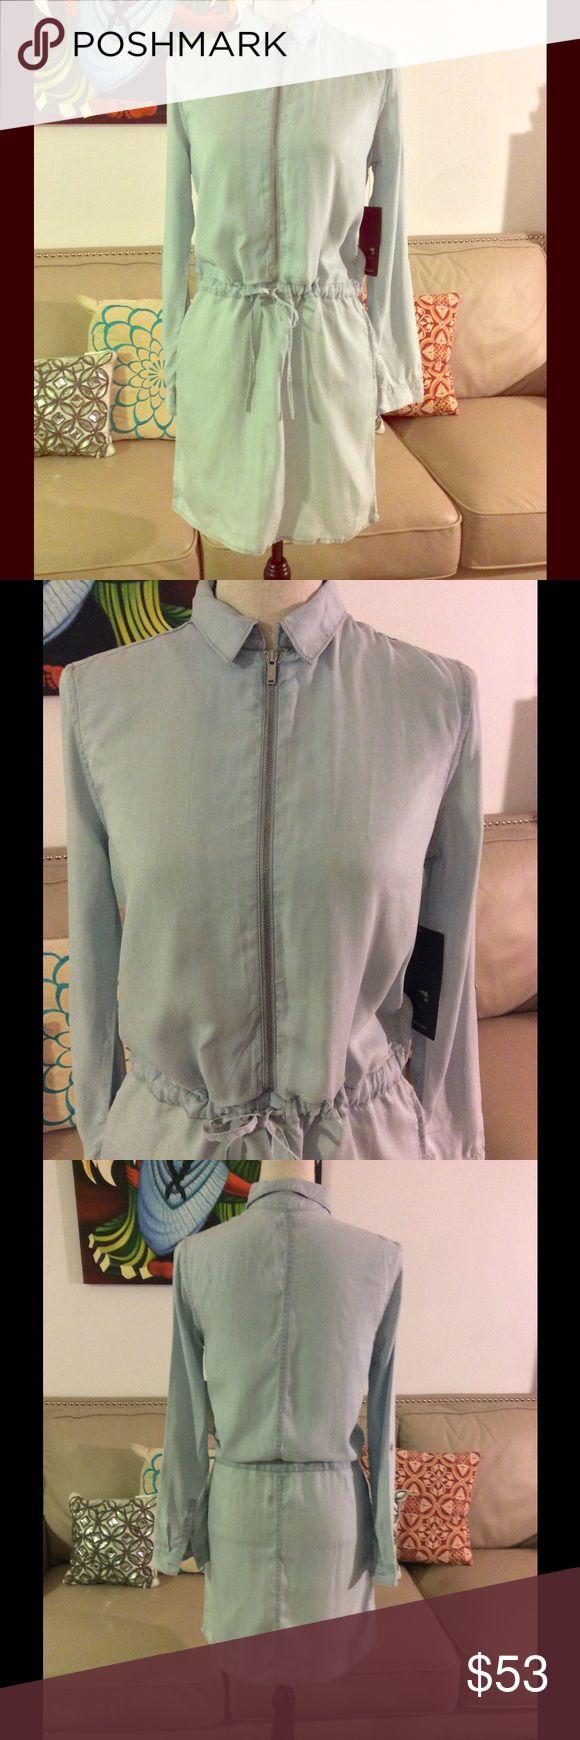 🔥SALE🔥Calvin Klein Jeans Dress Calvin Klein Jeans Denim Shirtdress is a modern casual look 👀 Calvin Klein Jeans Dresses